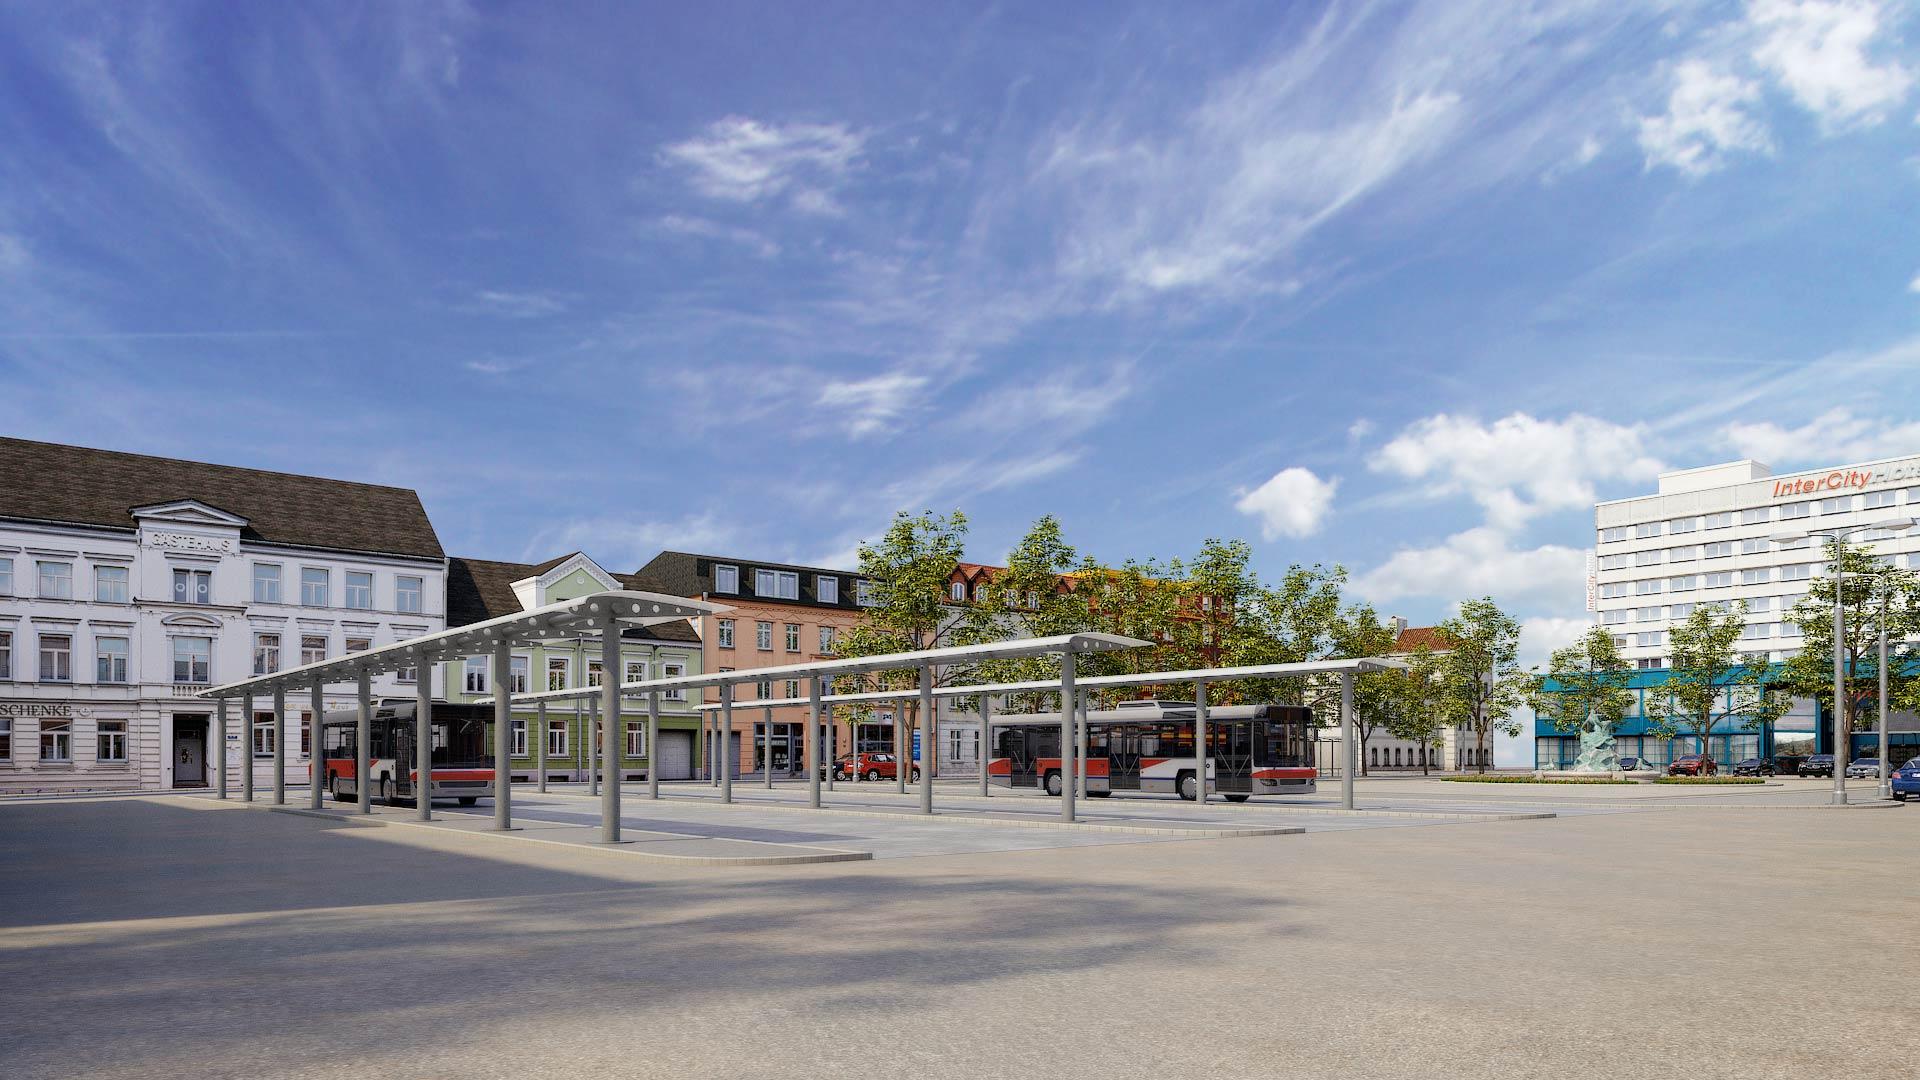 Bahnhof_Grunthalplatz_Schwerin_3D_Architekturvisualisierung Schwerin Grunthalplatz 3D Architekturvisualisierung